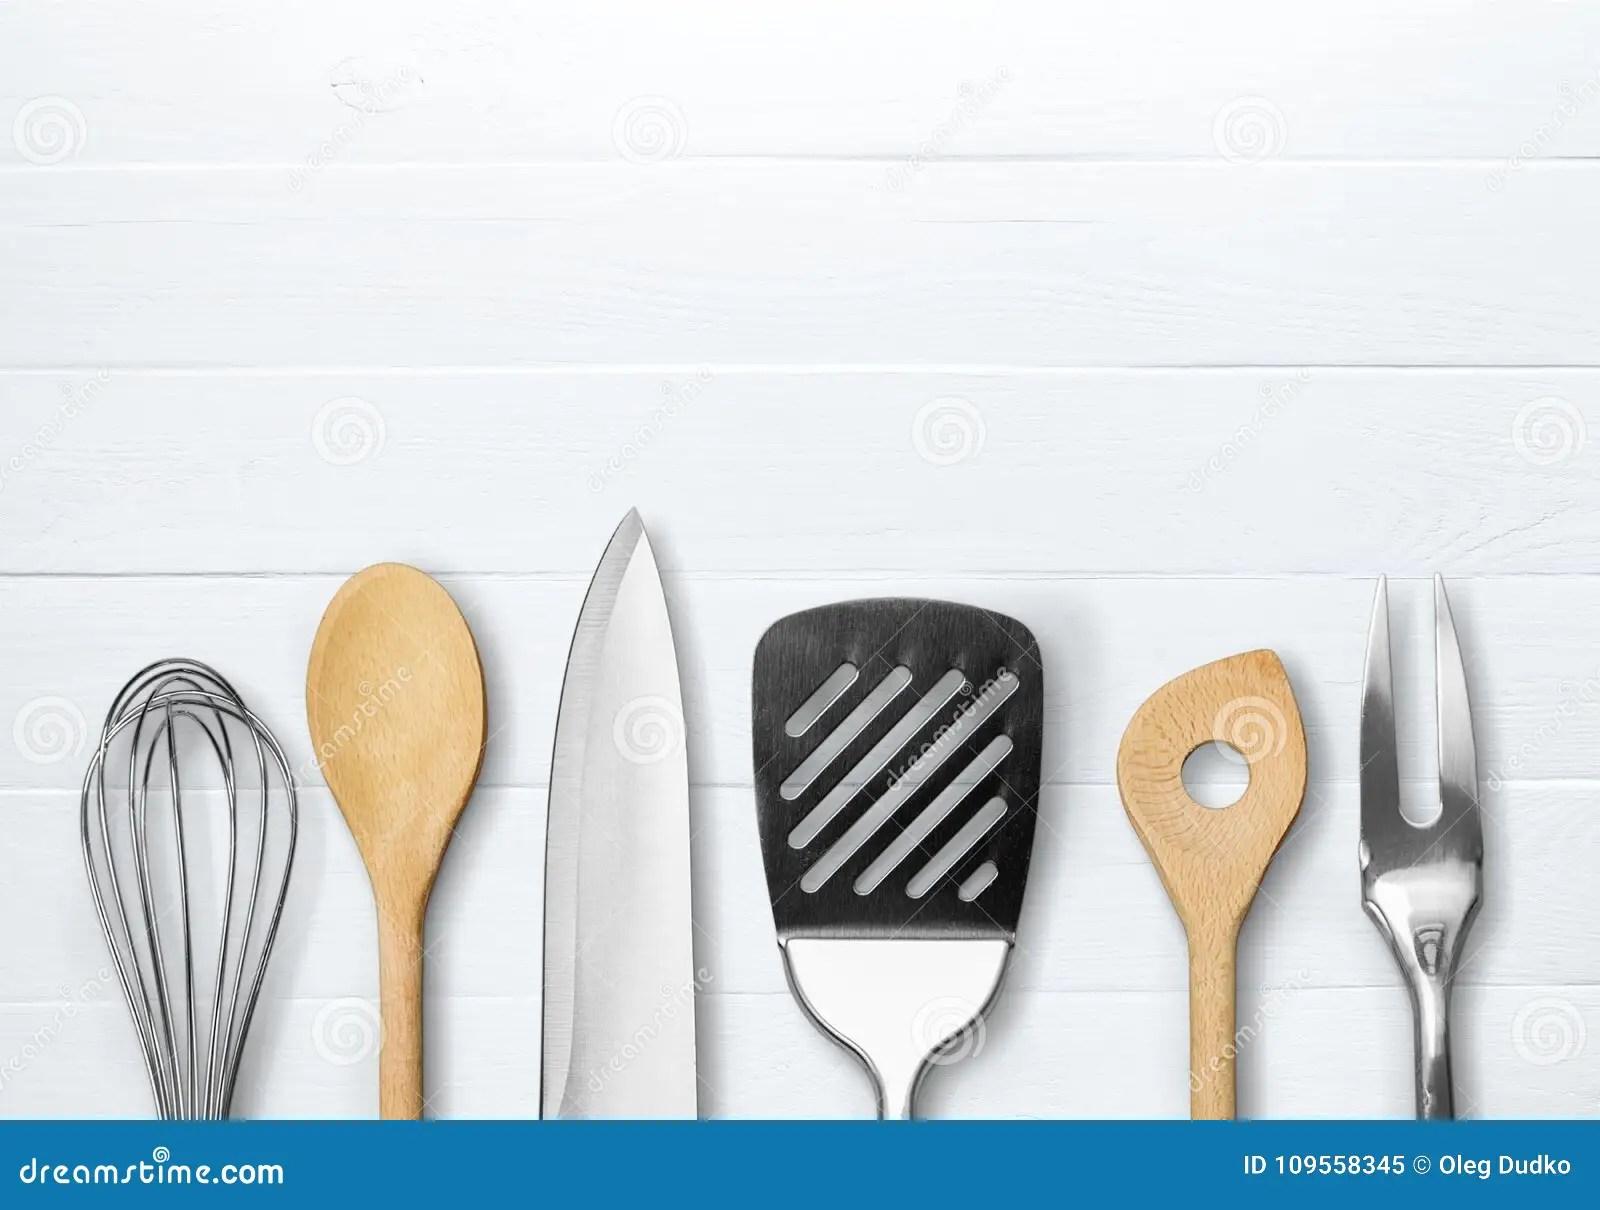 oil dispenser kitchen cheap remodels 厨房金属和木器物在背景库存图片 图片包括有对象 豪华 国内 设备 厨房金属和木器物在背景